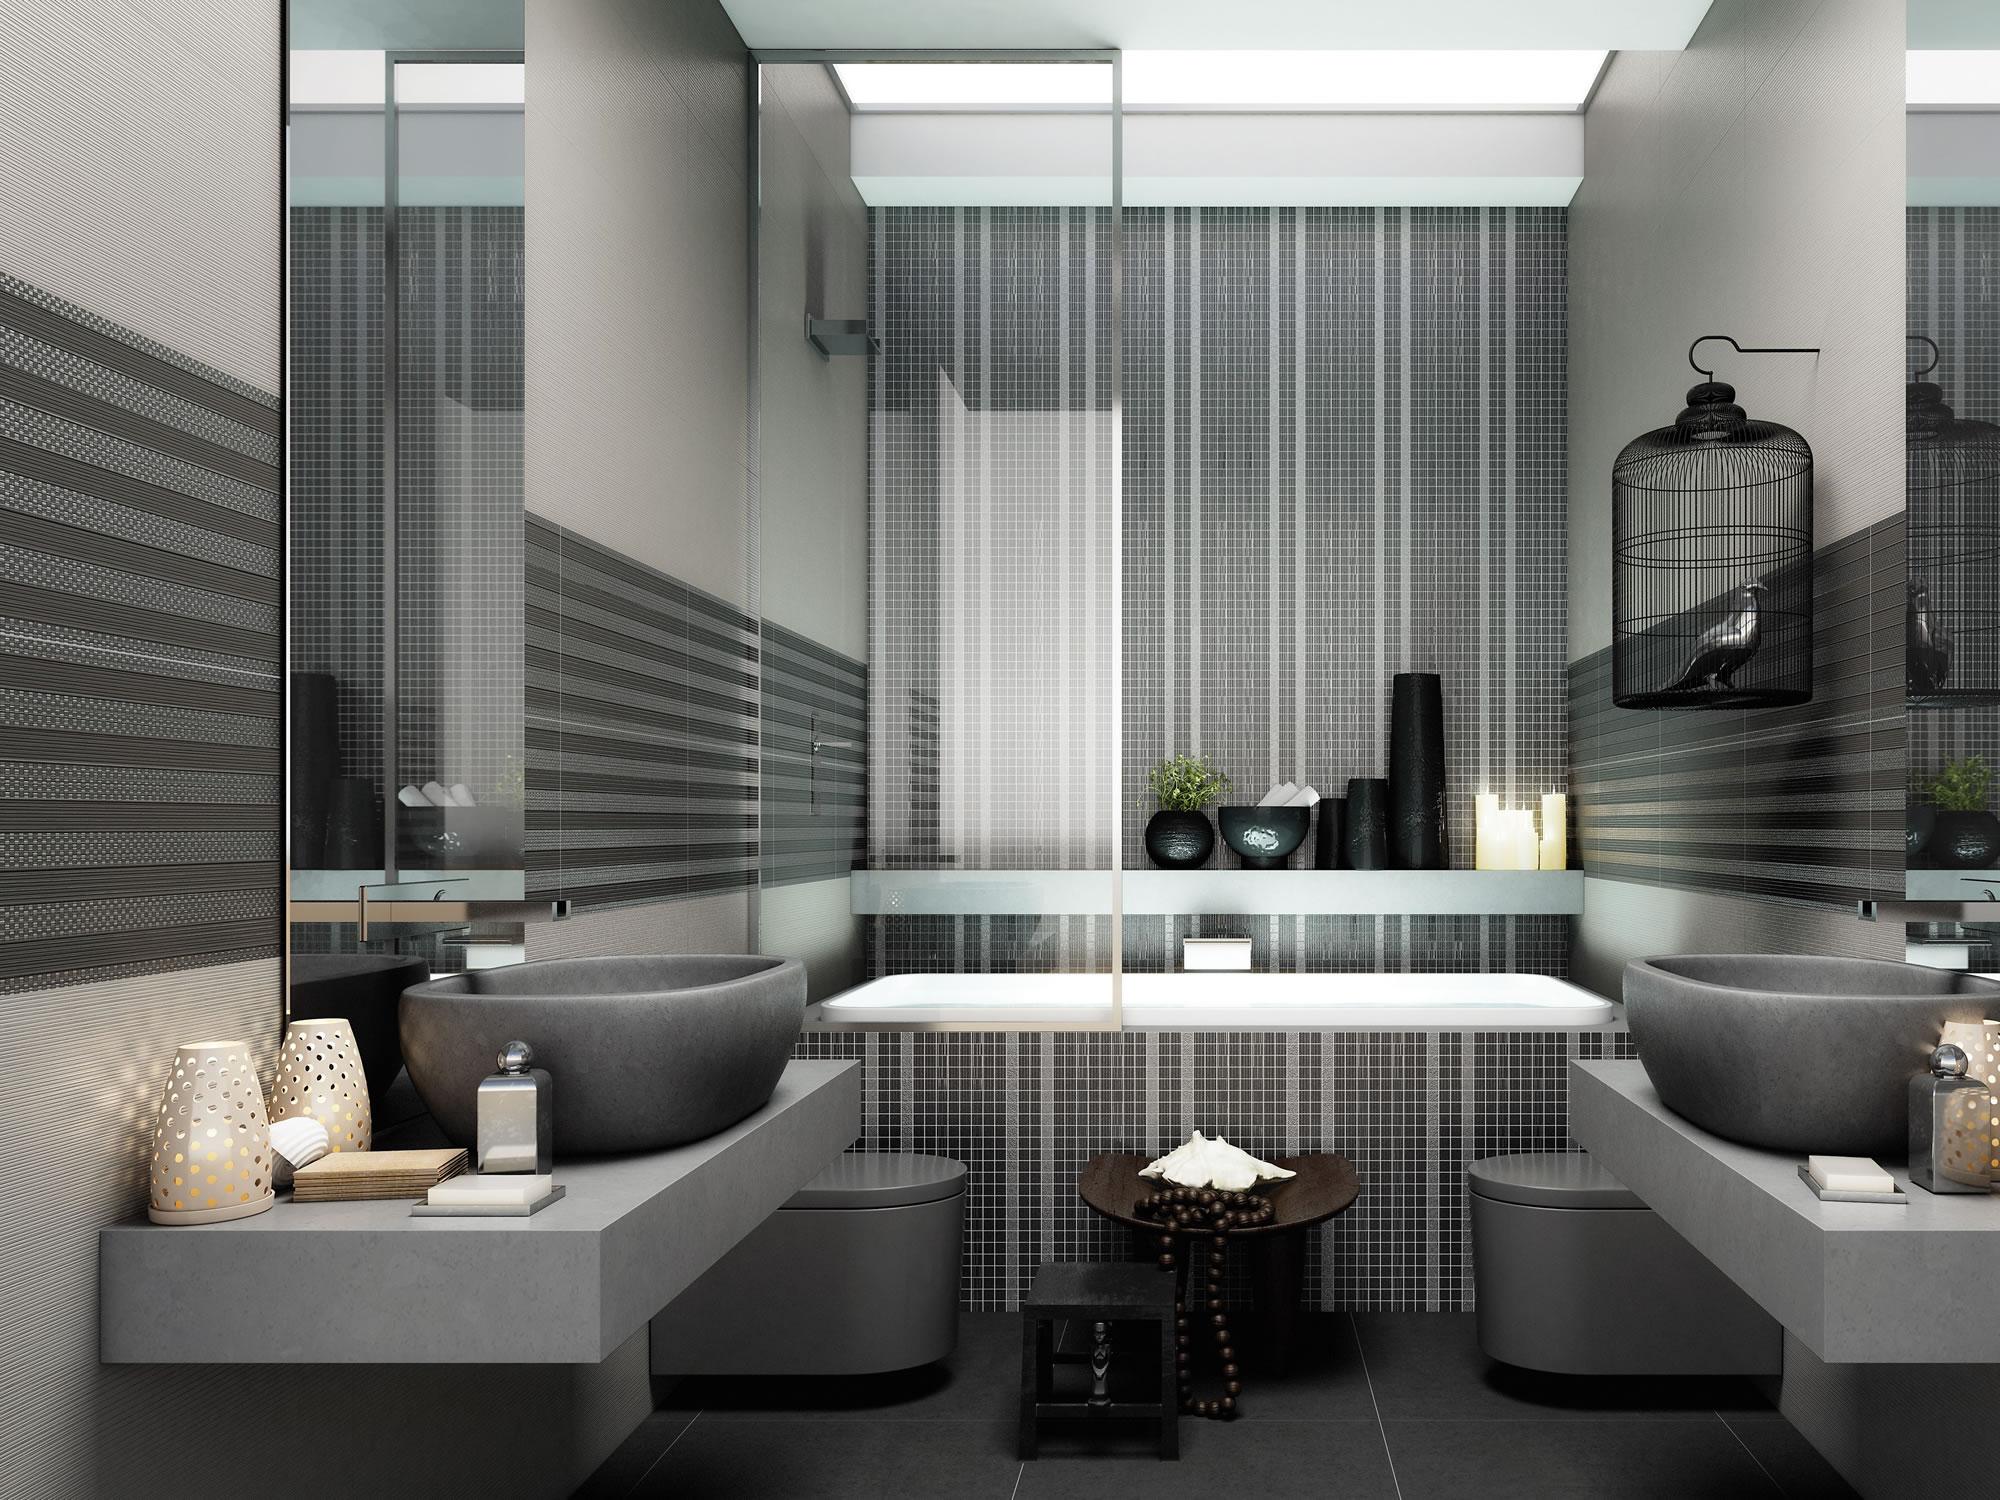 Marca corona pavimenti boiserie in ceramica per bagno - Boiserie in ceramica per bagno ...